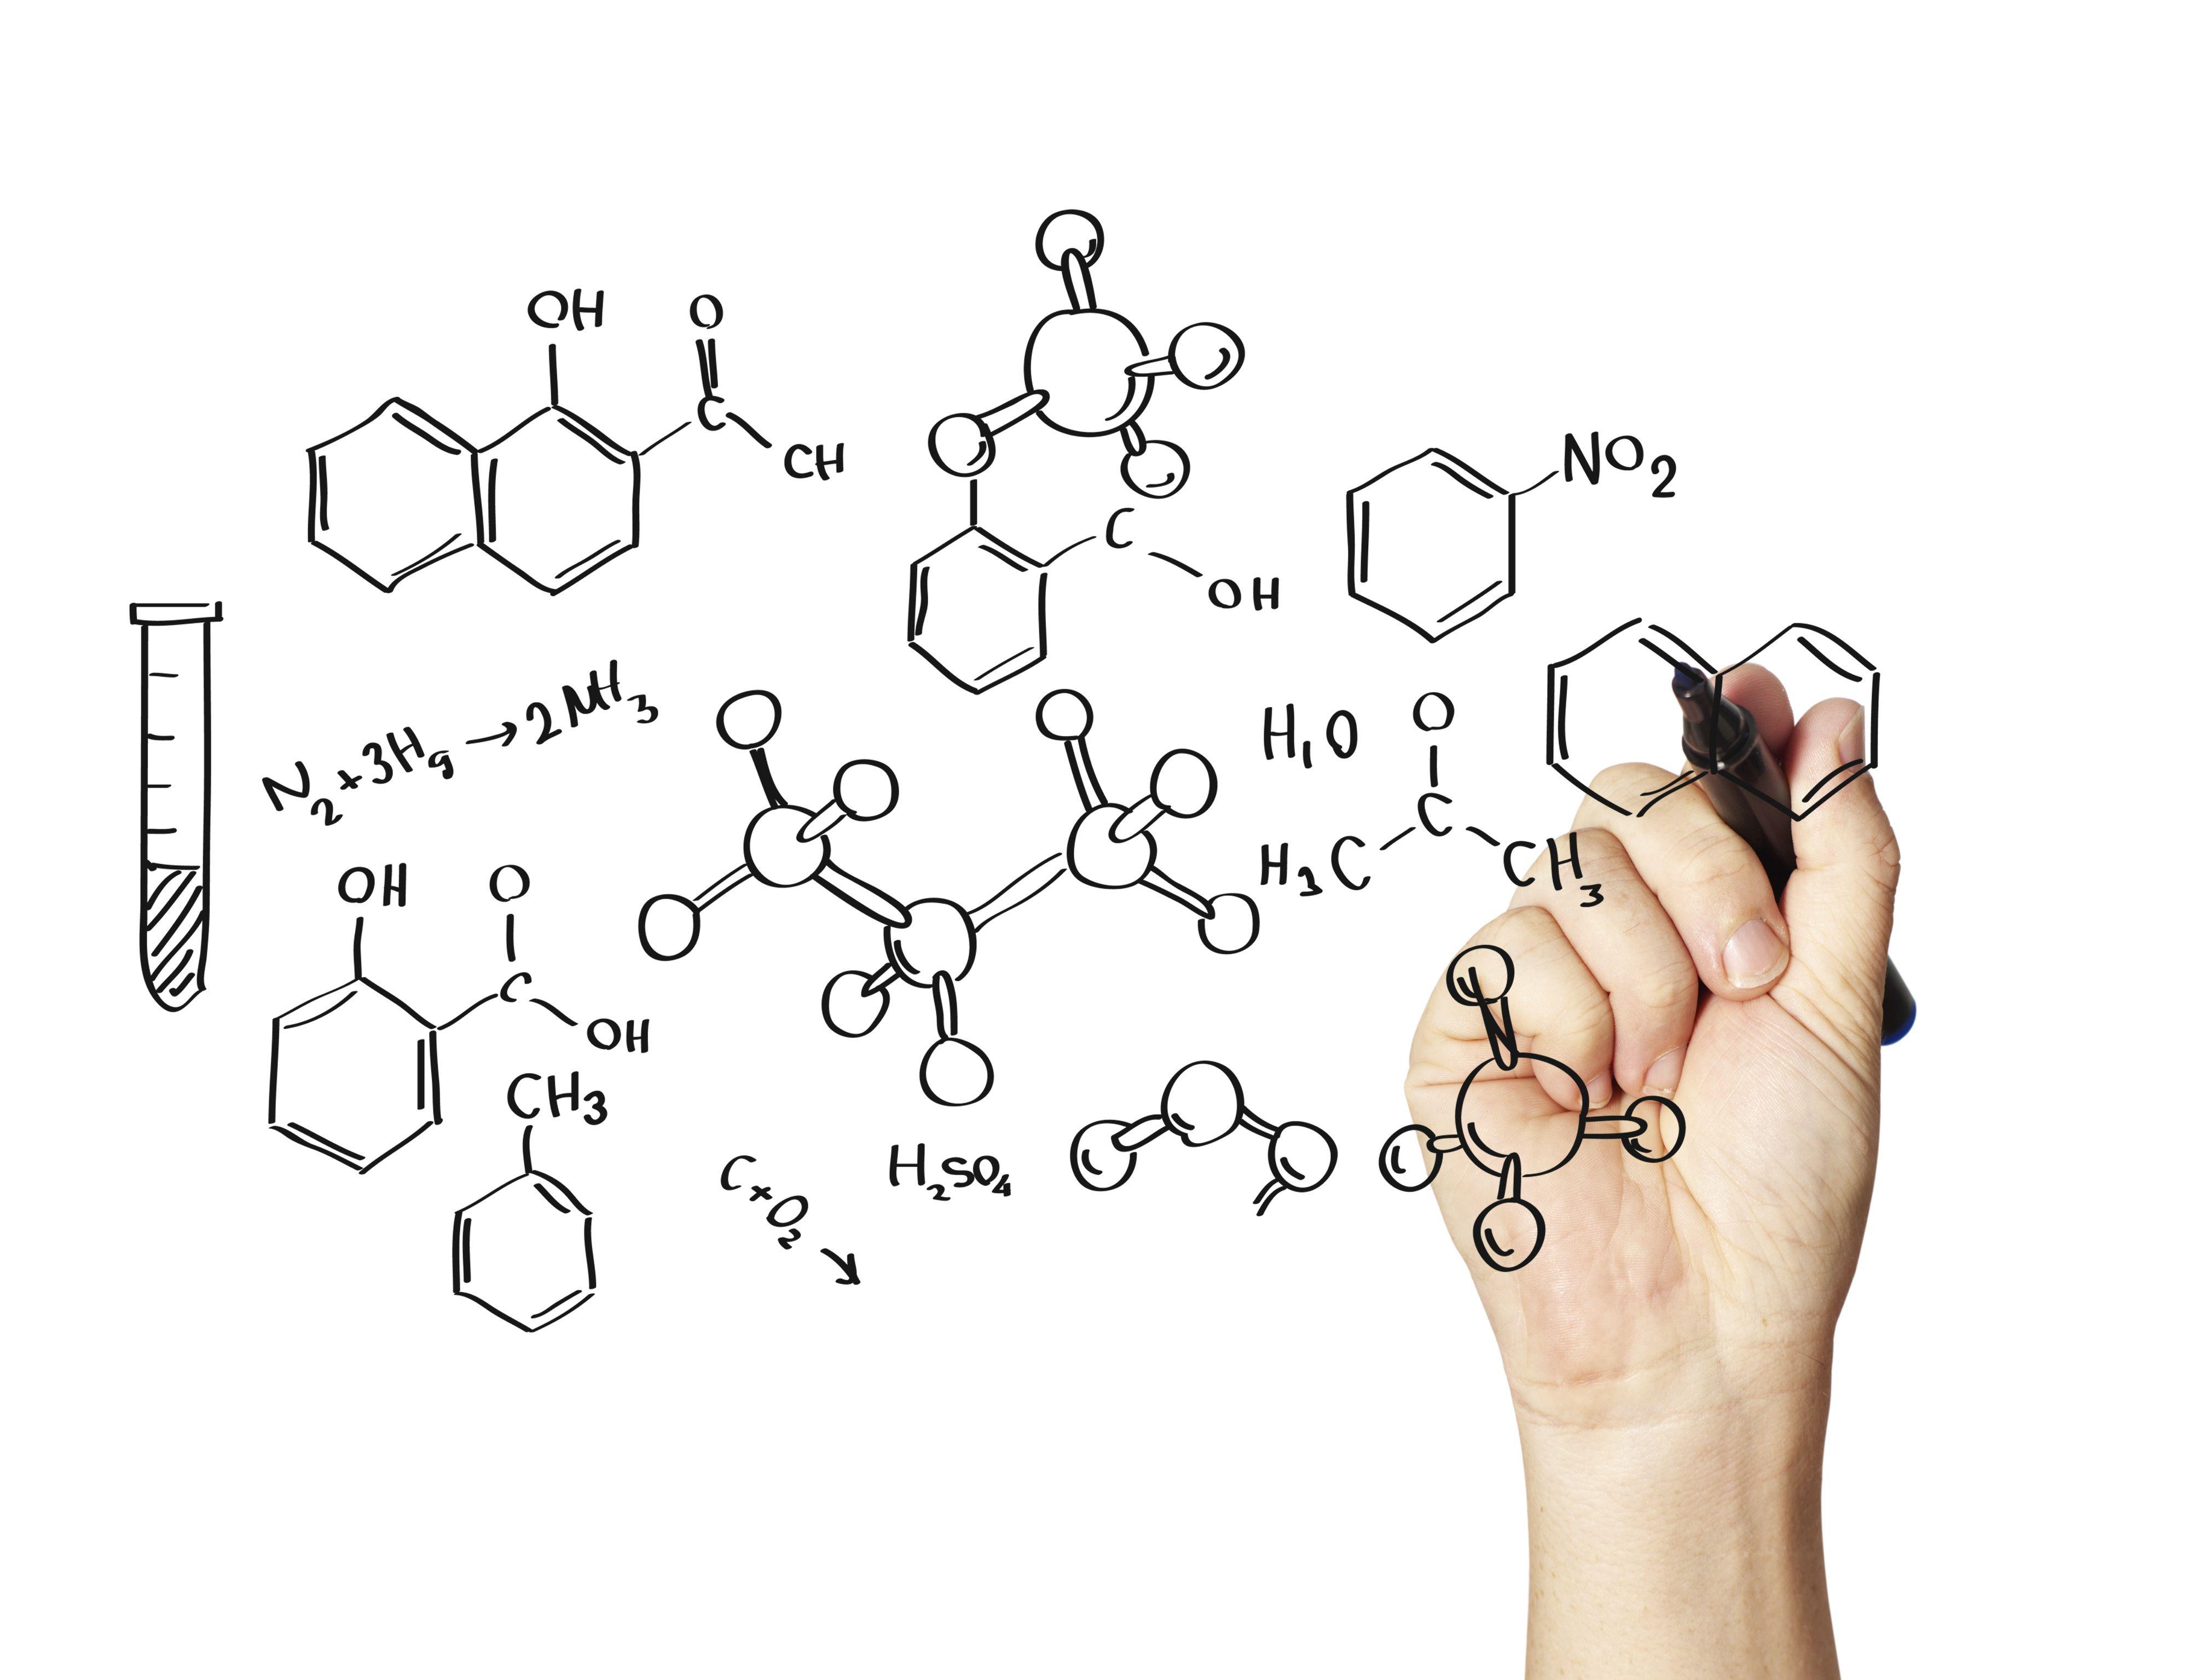 Chemical Formulas Practice Test Questions